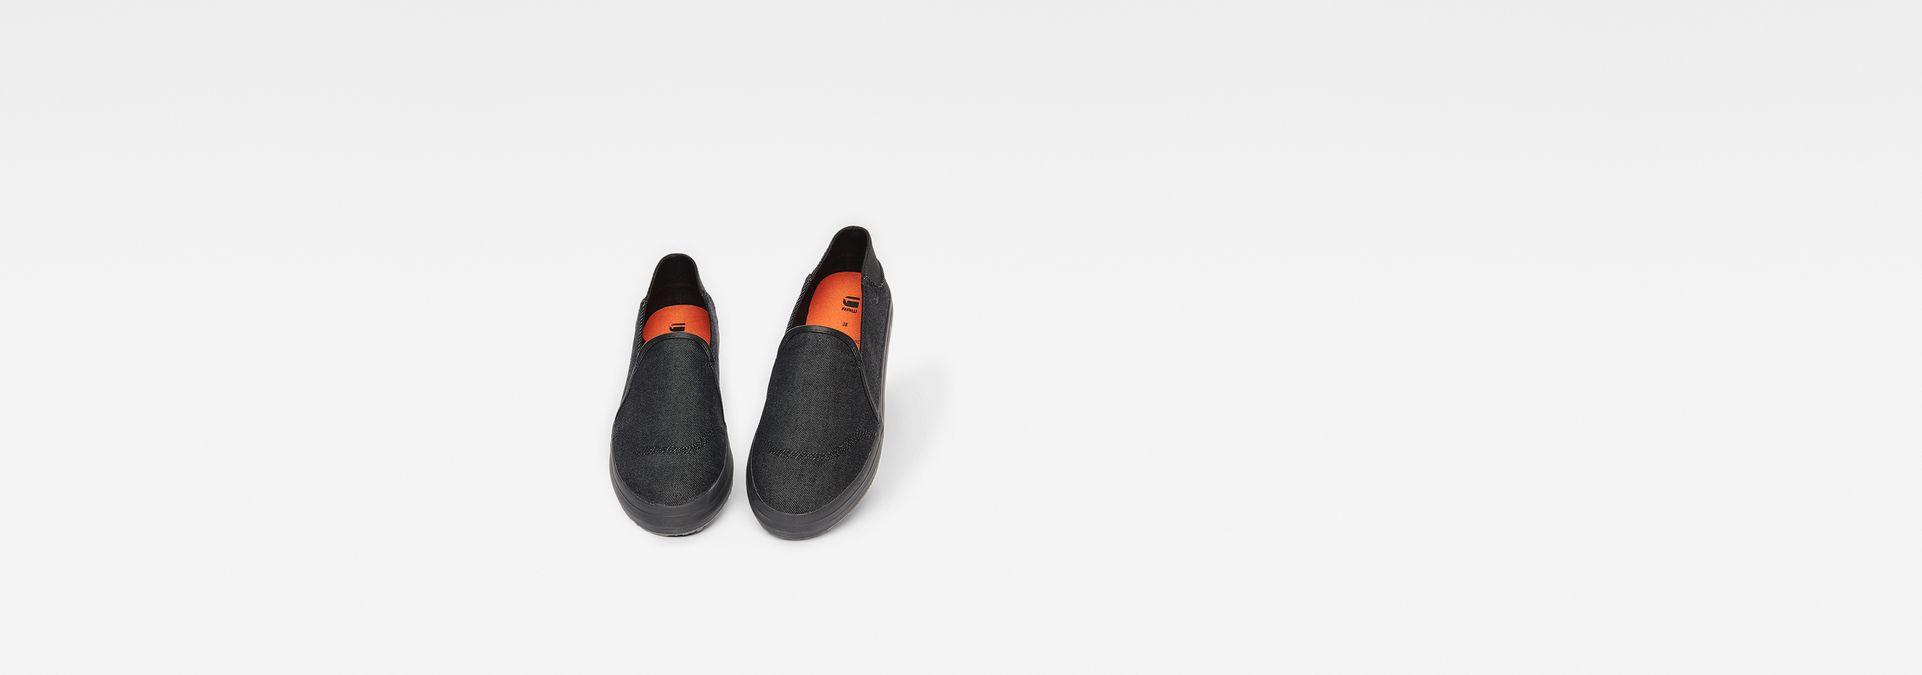 b6de5e5665a G-Star RAW® Kendo Mono Slip-On Sneakers Black side view ...